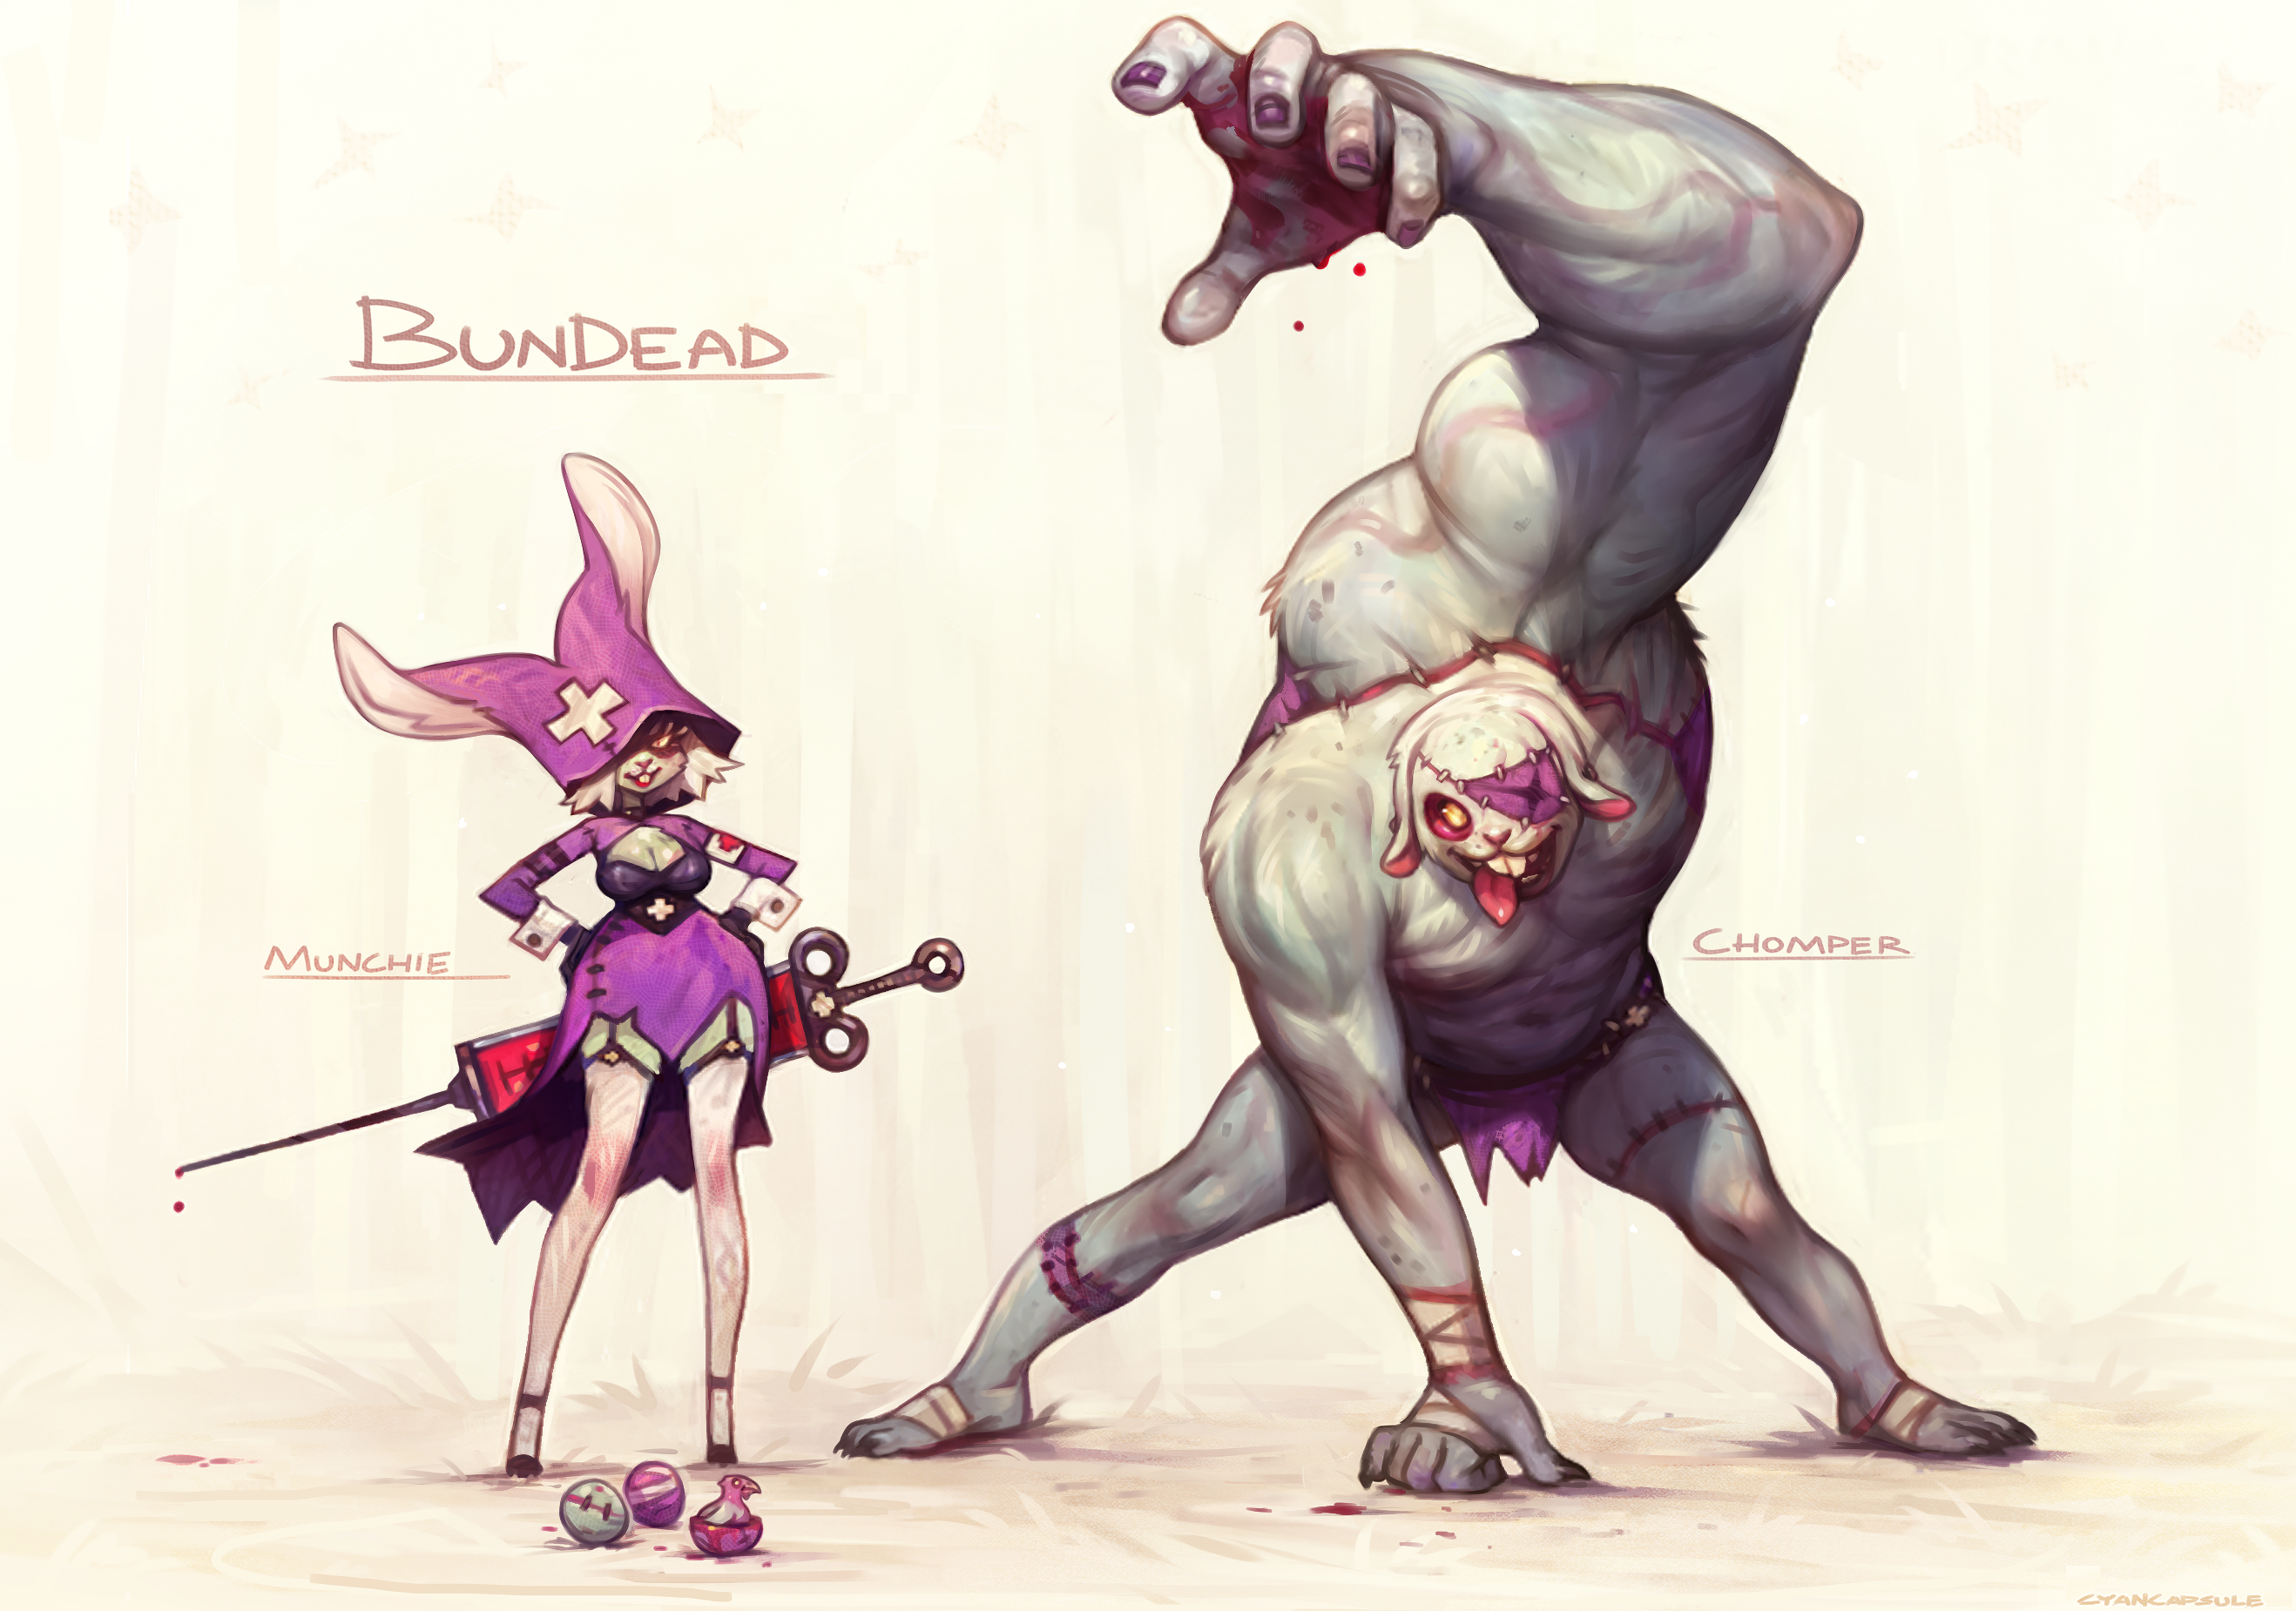 Bundeads